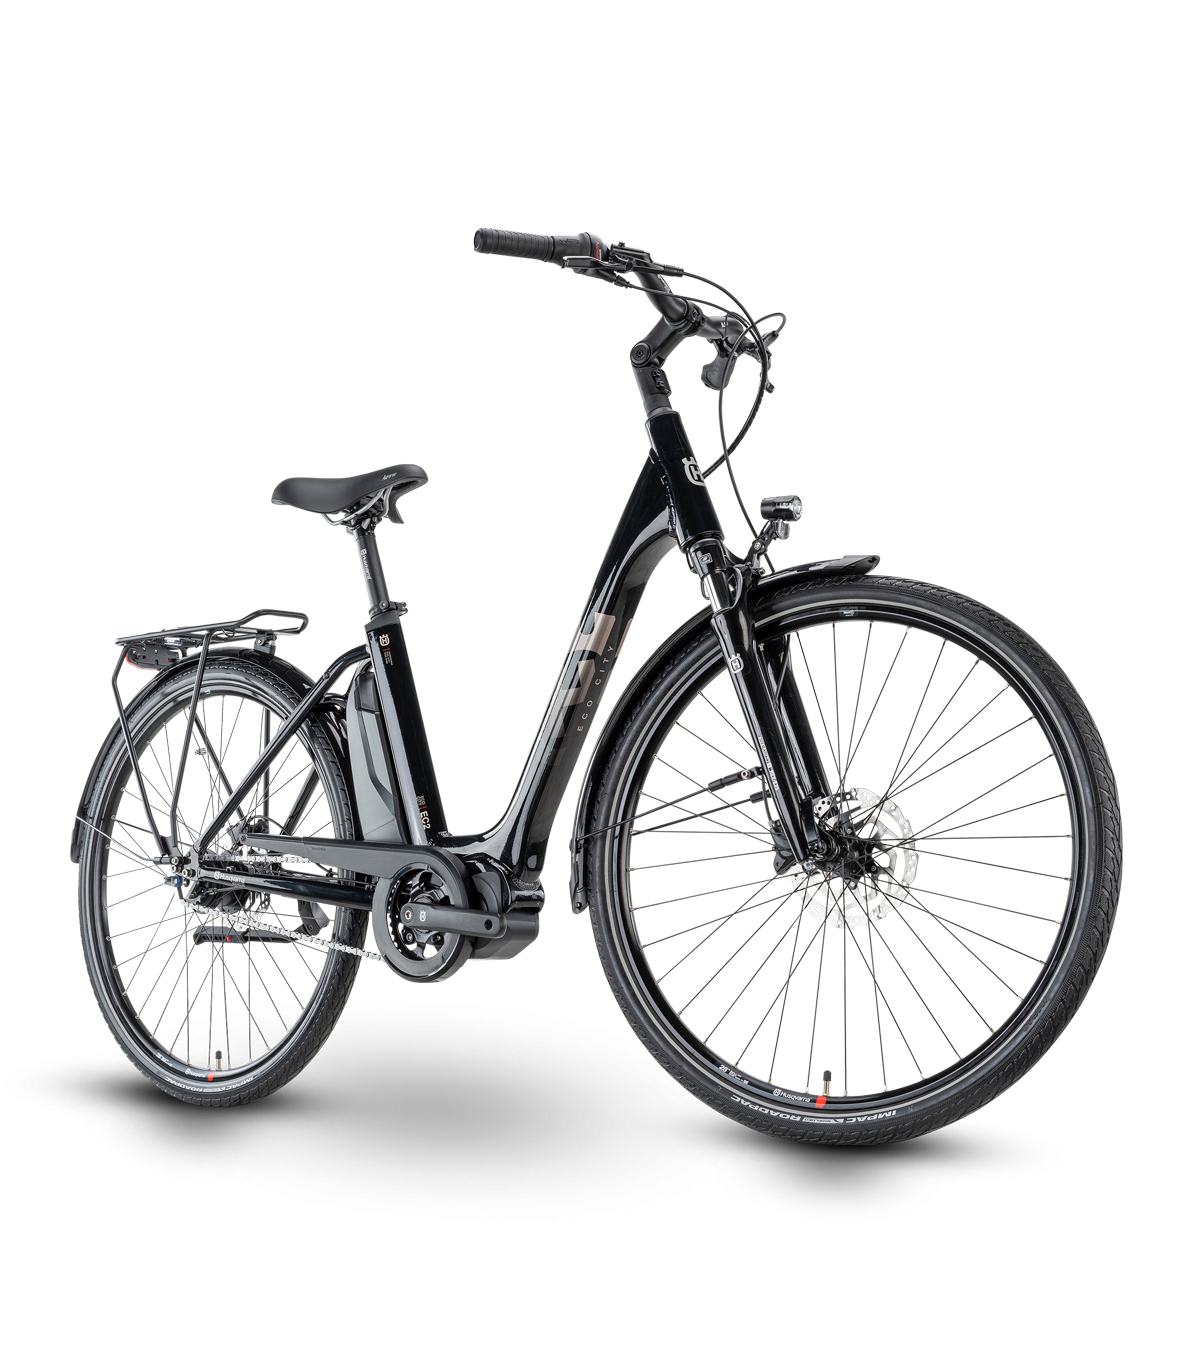 Pho bike pers revo hqv 21 ecocity ec2 black bronze oblique web sall aepi v1